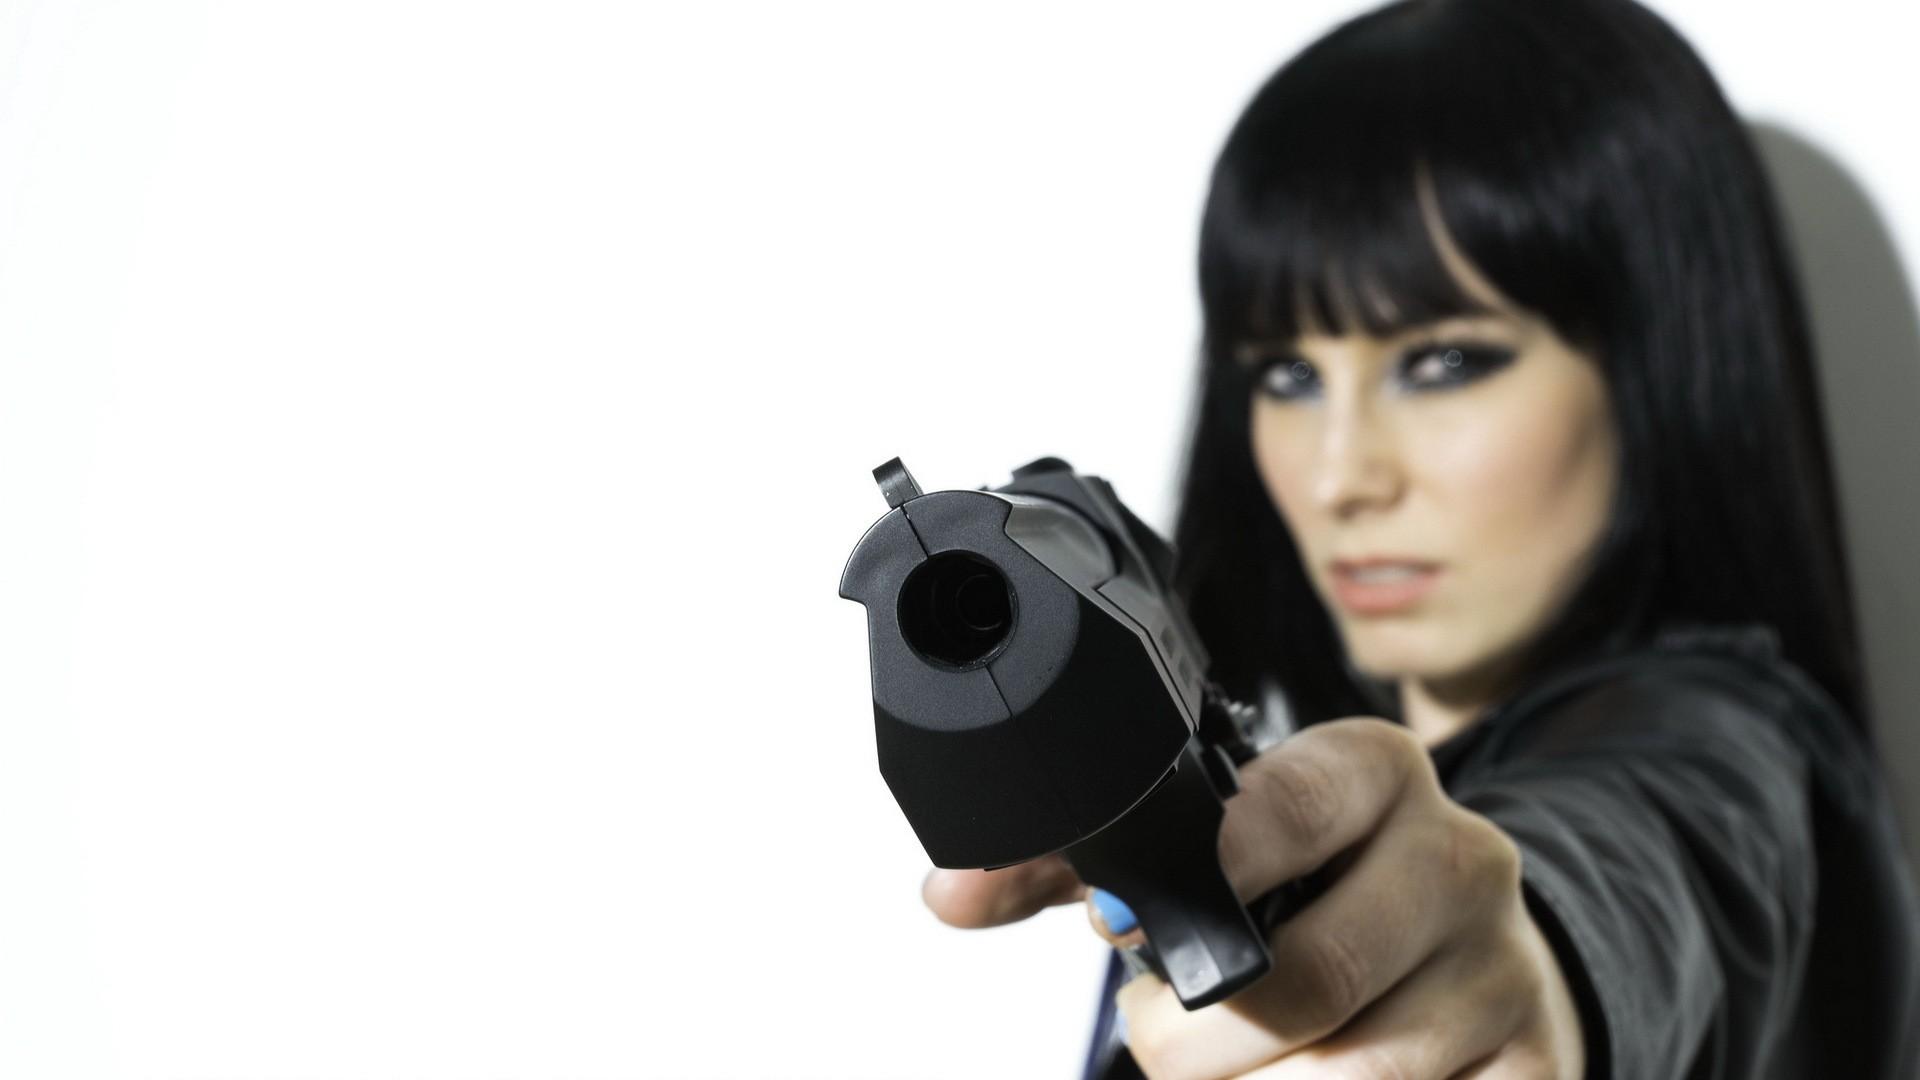 gun girl computer wallpapers - photo #3